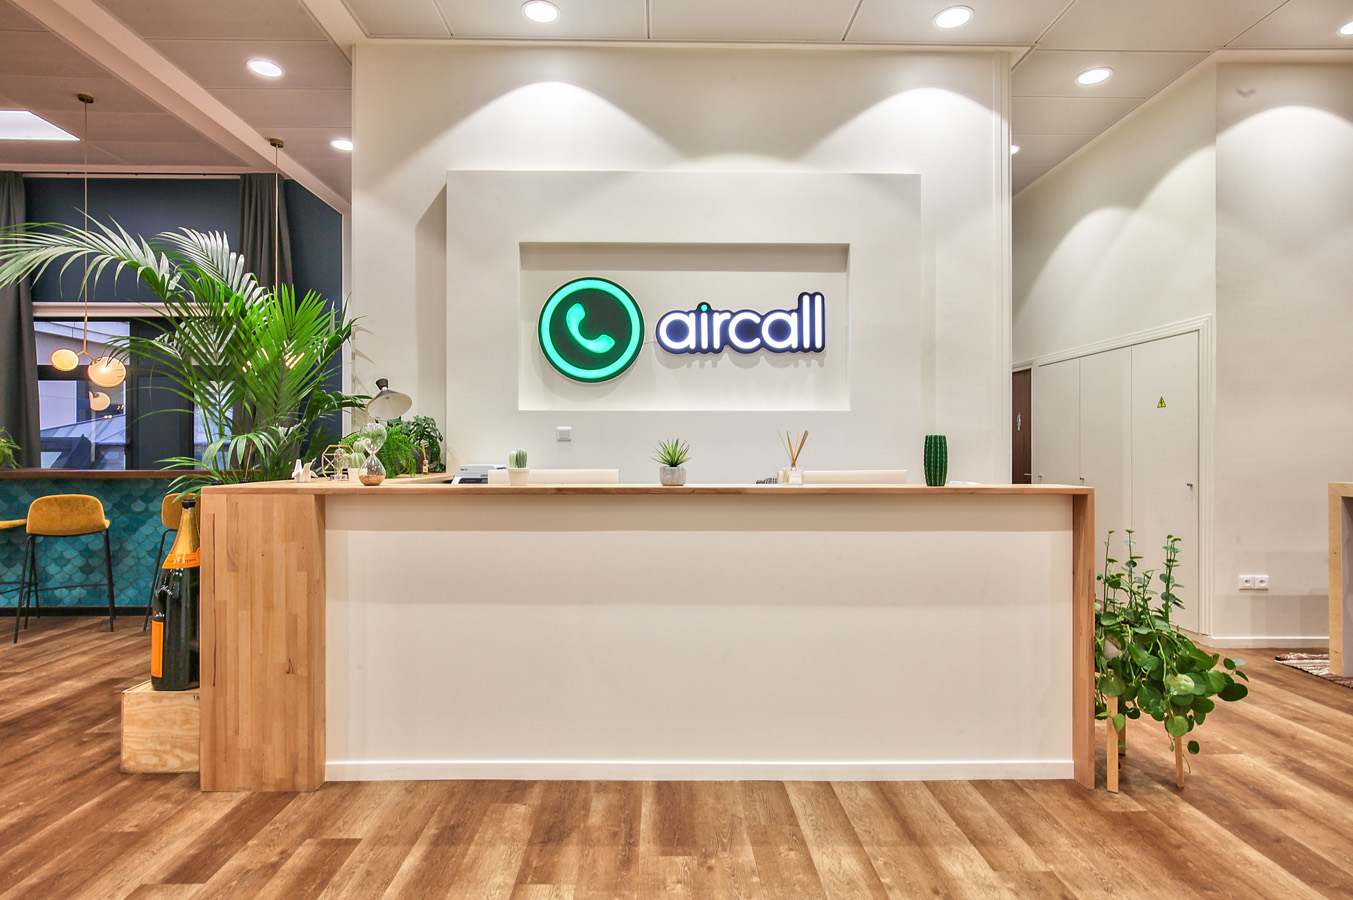 nicolas vade - architecture interieur - bureaux design - Aircall - accueil.jpg